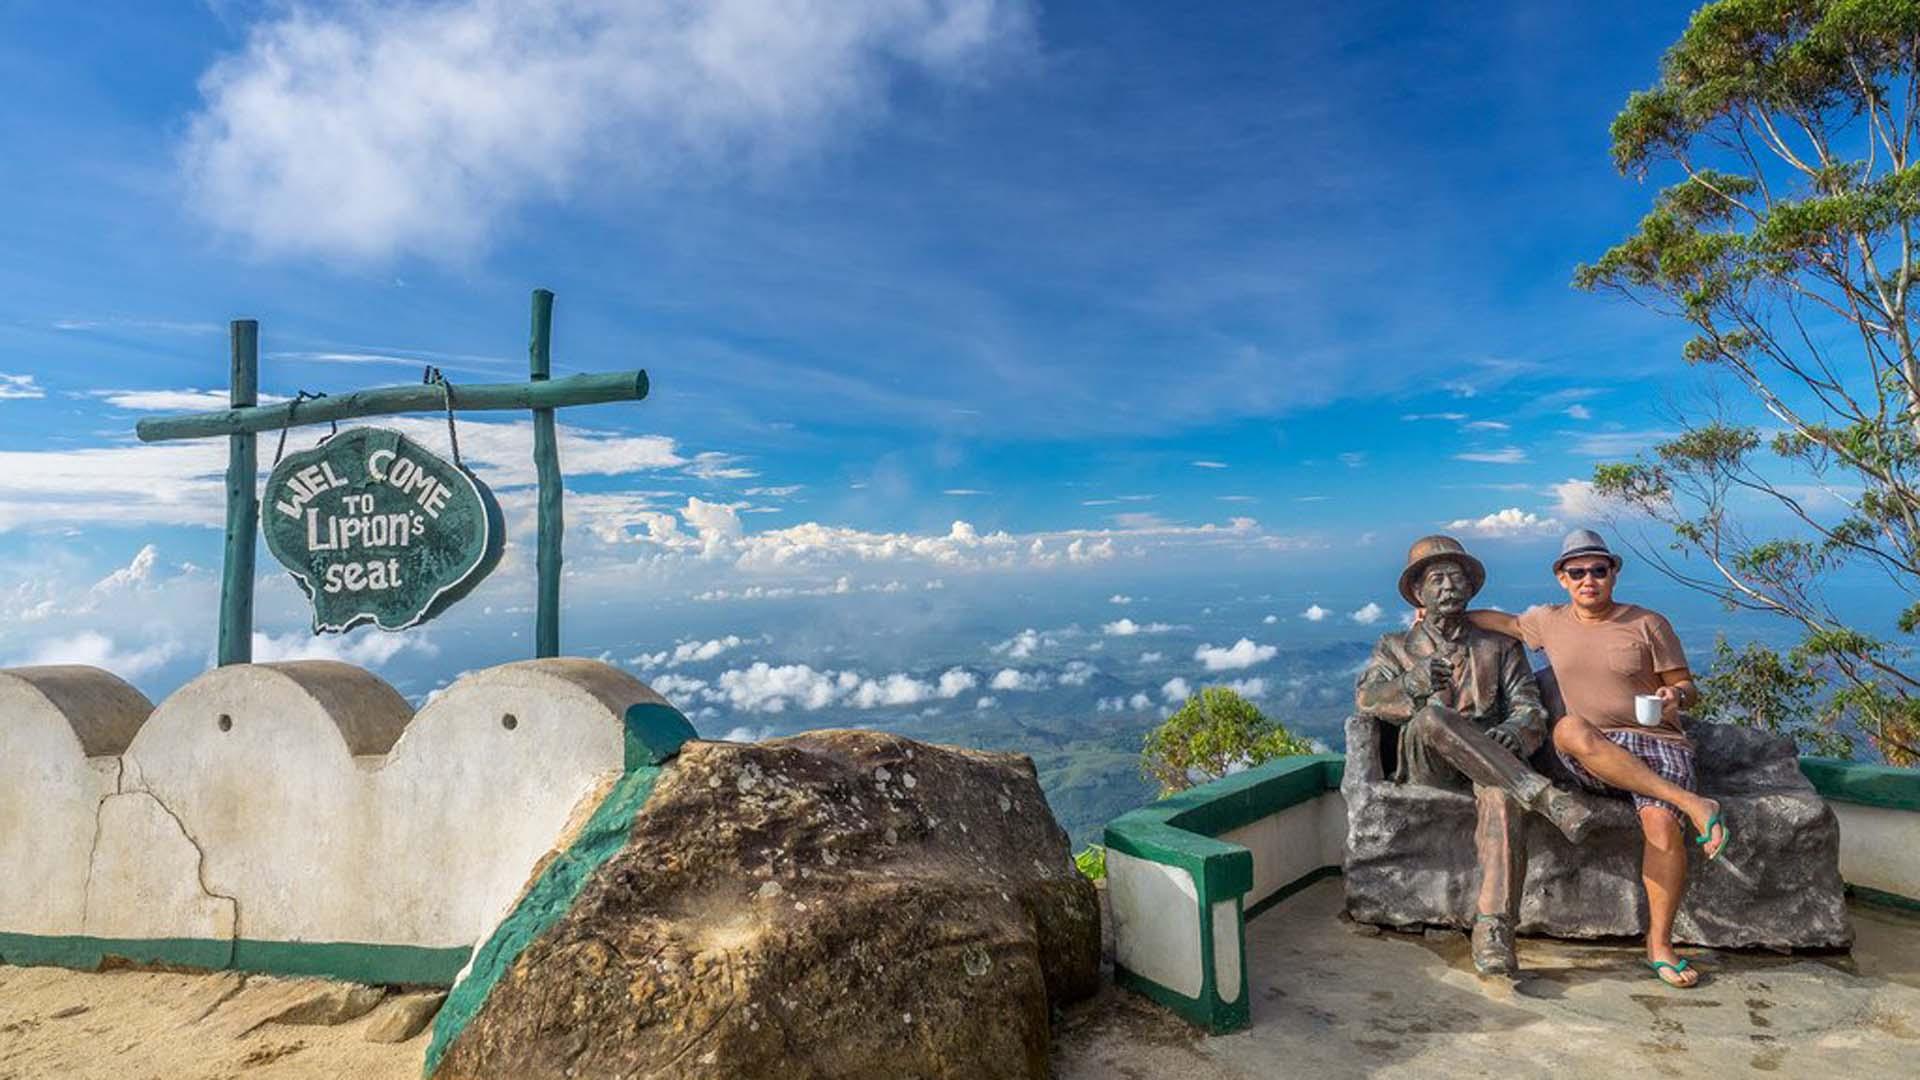 Lipton Seat in Sri Lanka